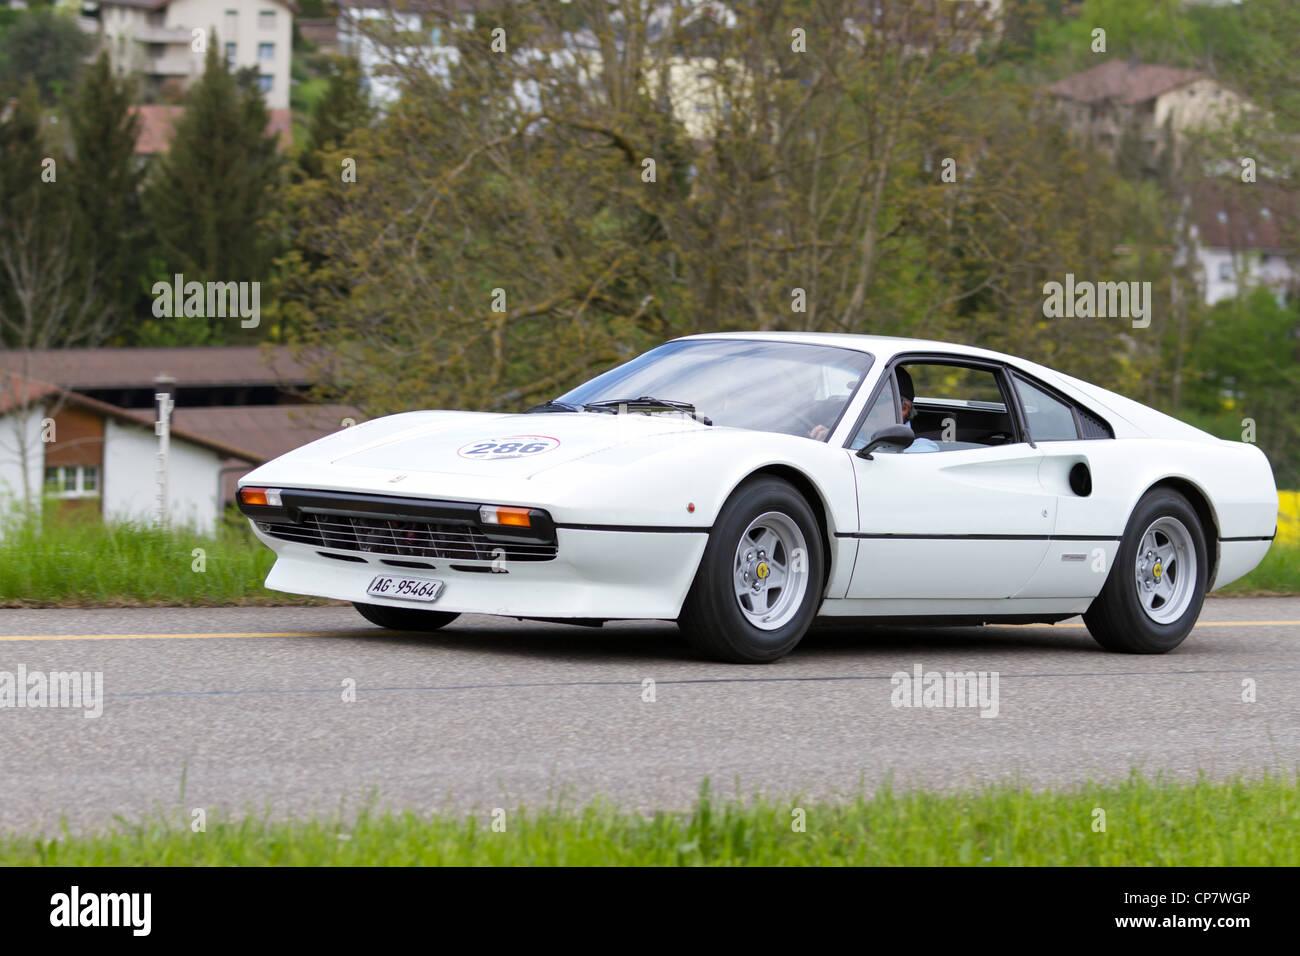 Vintage car Ferrari 308 GTB from 1977 at Grand Prix in Mutschellen, SUI on April 29, 2012. - Stock Image